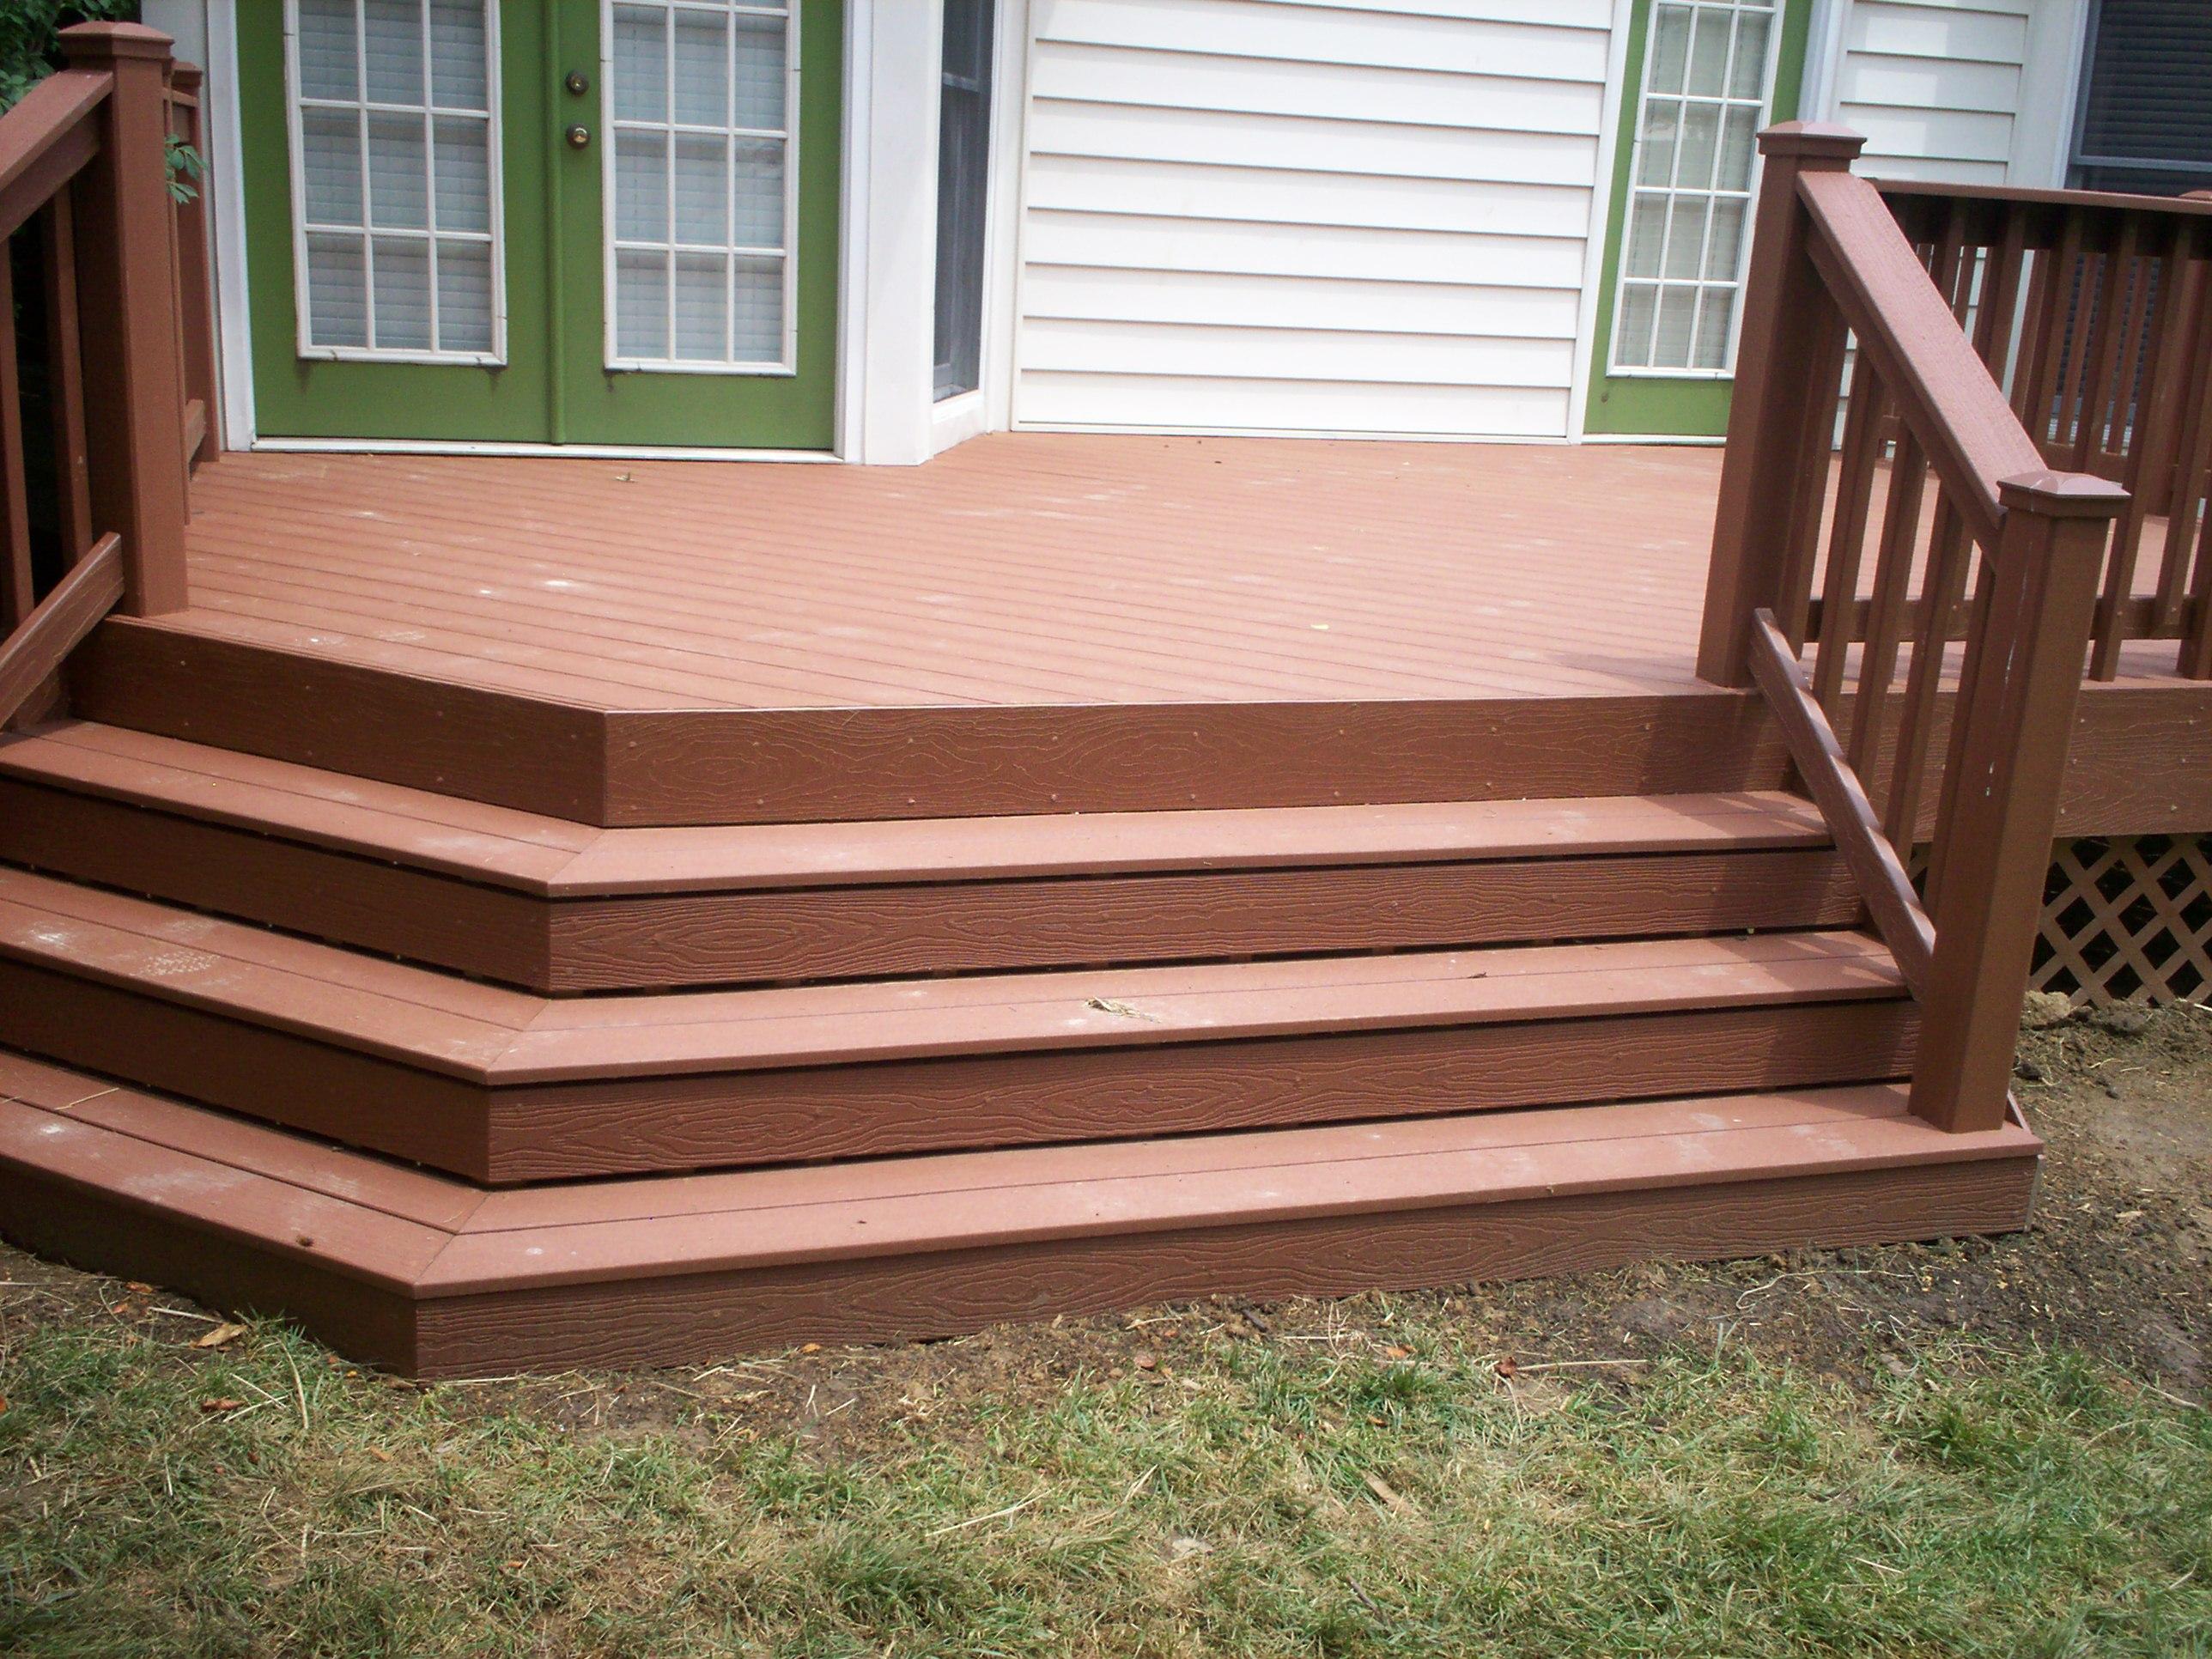 St. Louis Decks: Wide Deck Stairs | St. Louis decks ... on Backyard Stairs Ideas id=35358